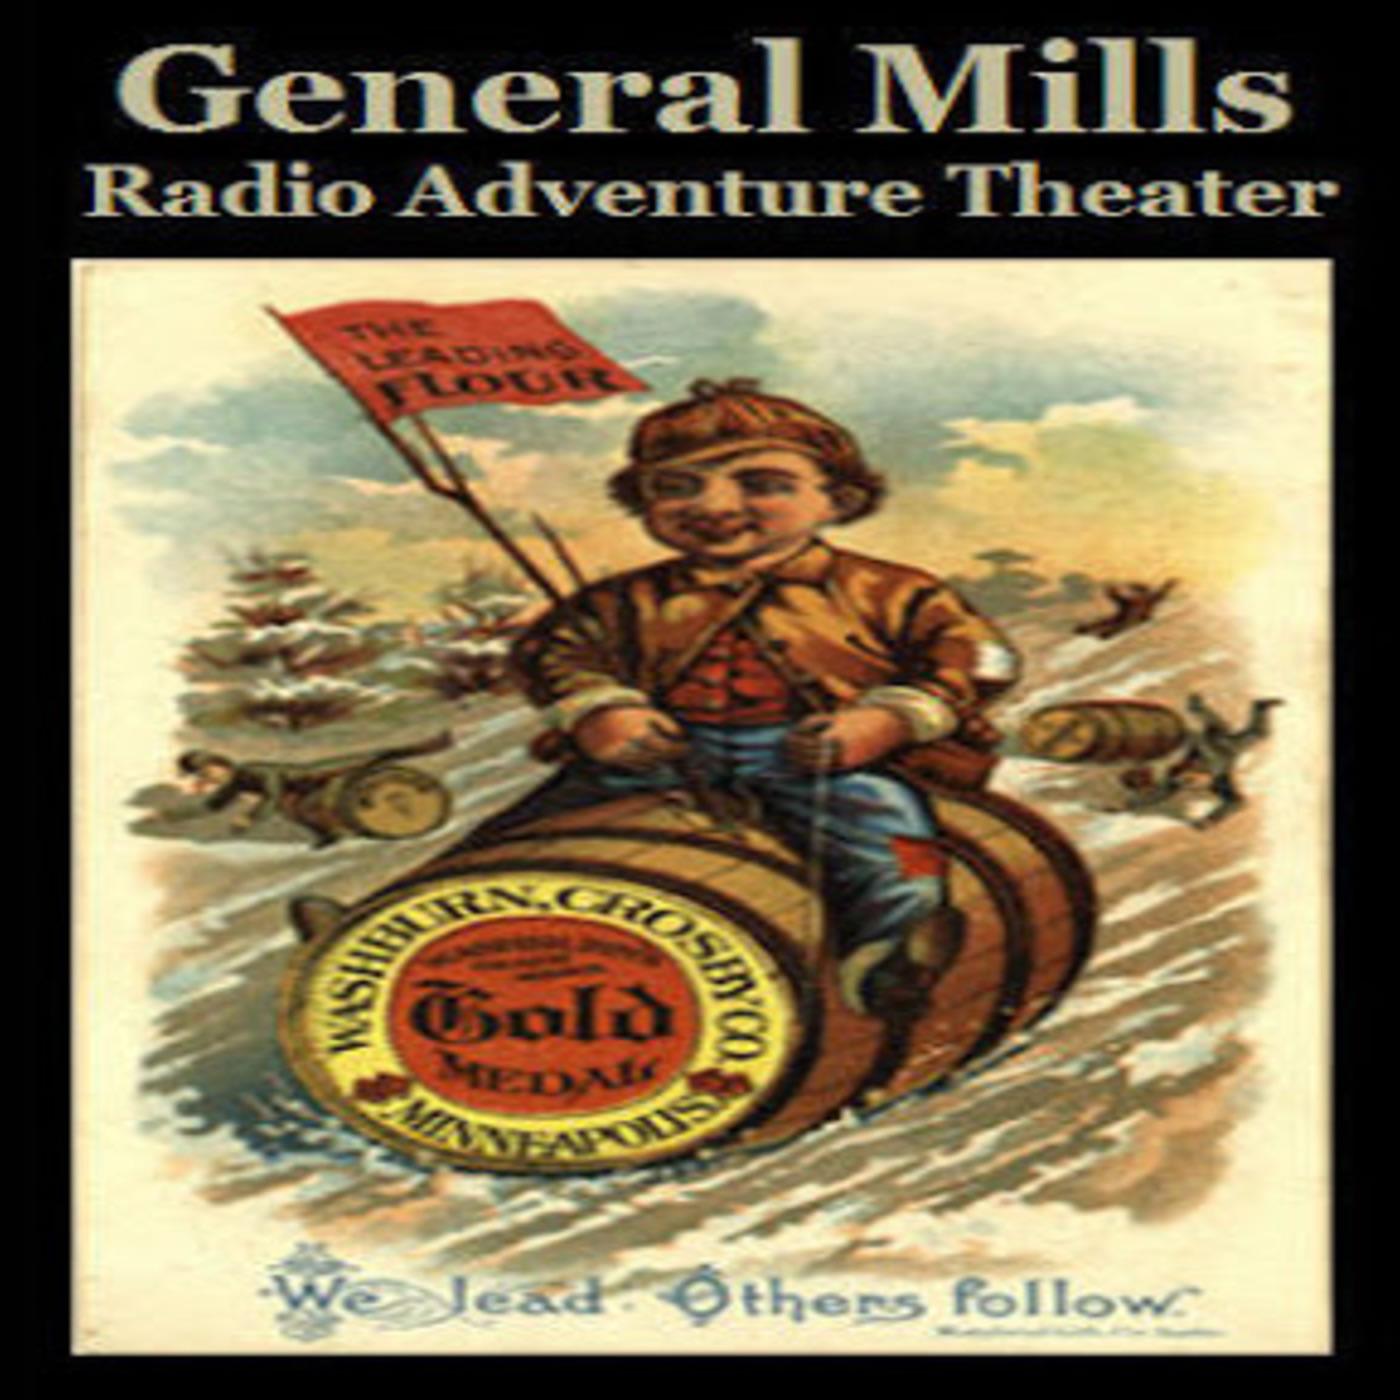 The General Mills Radio Adventure Theater